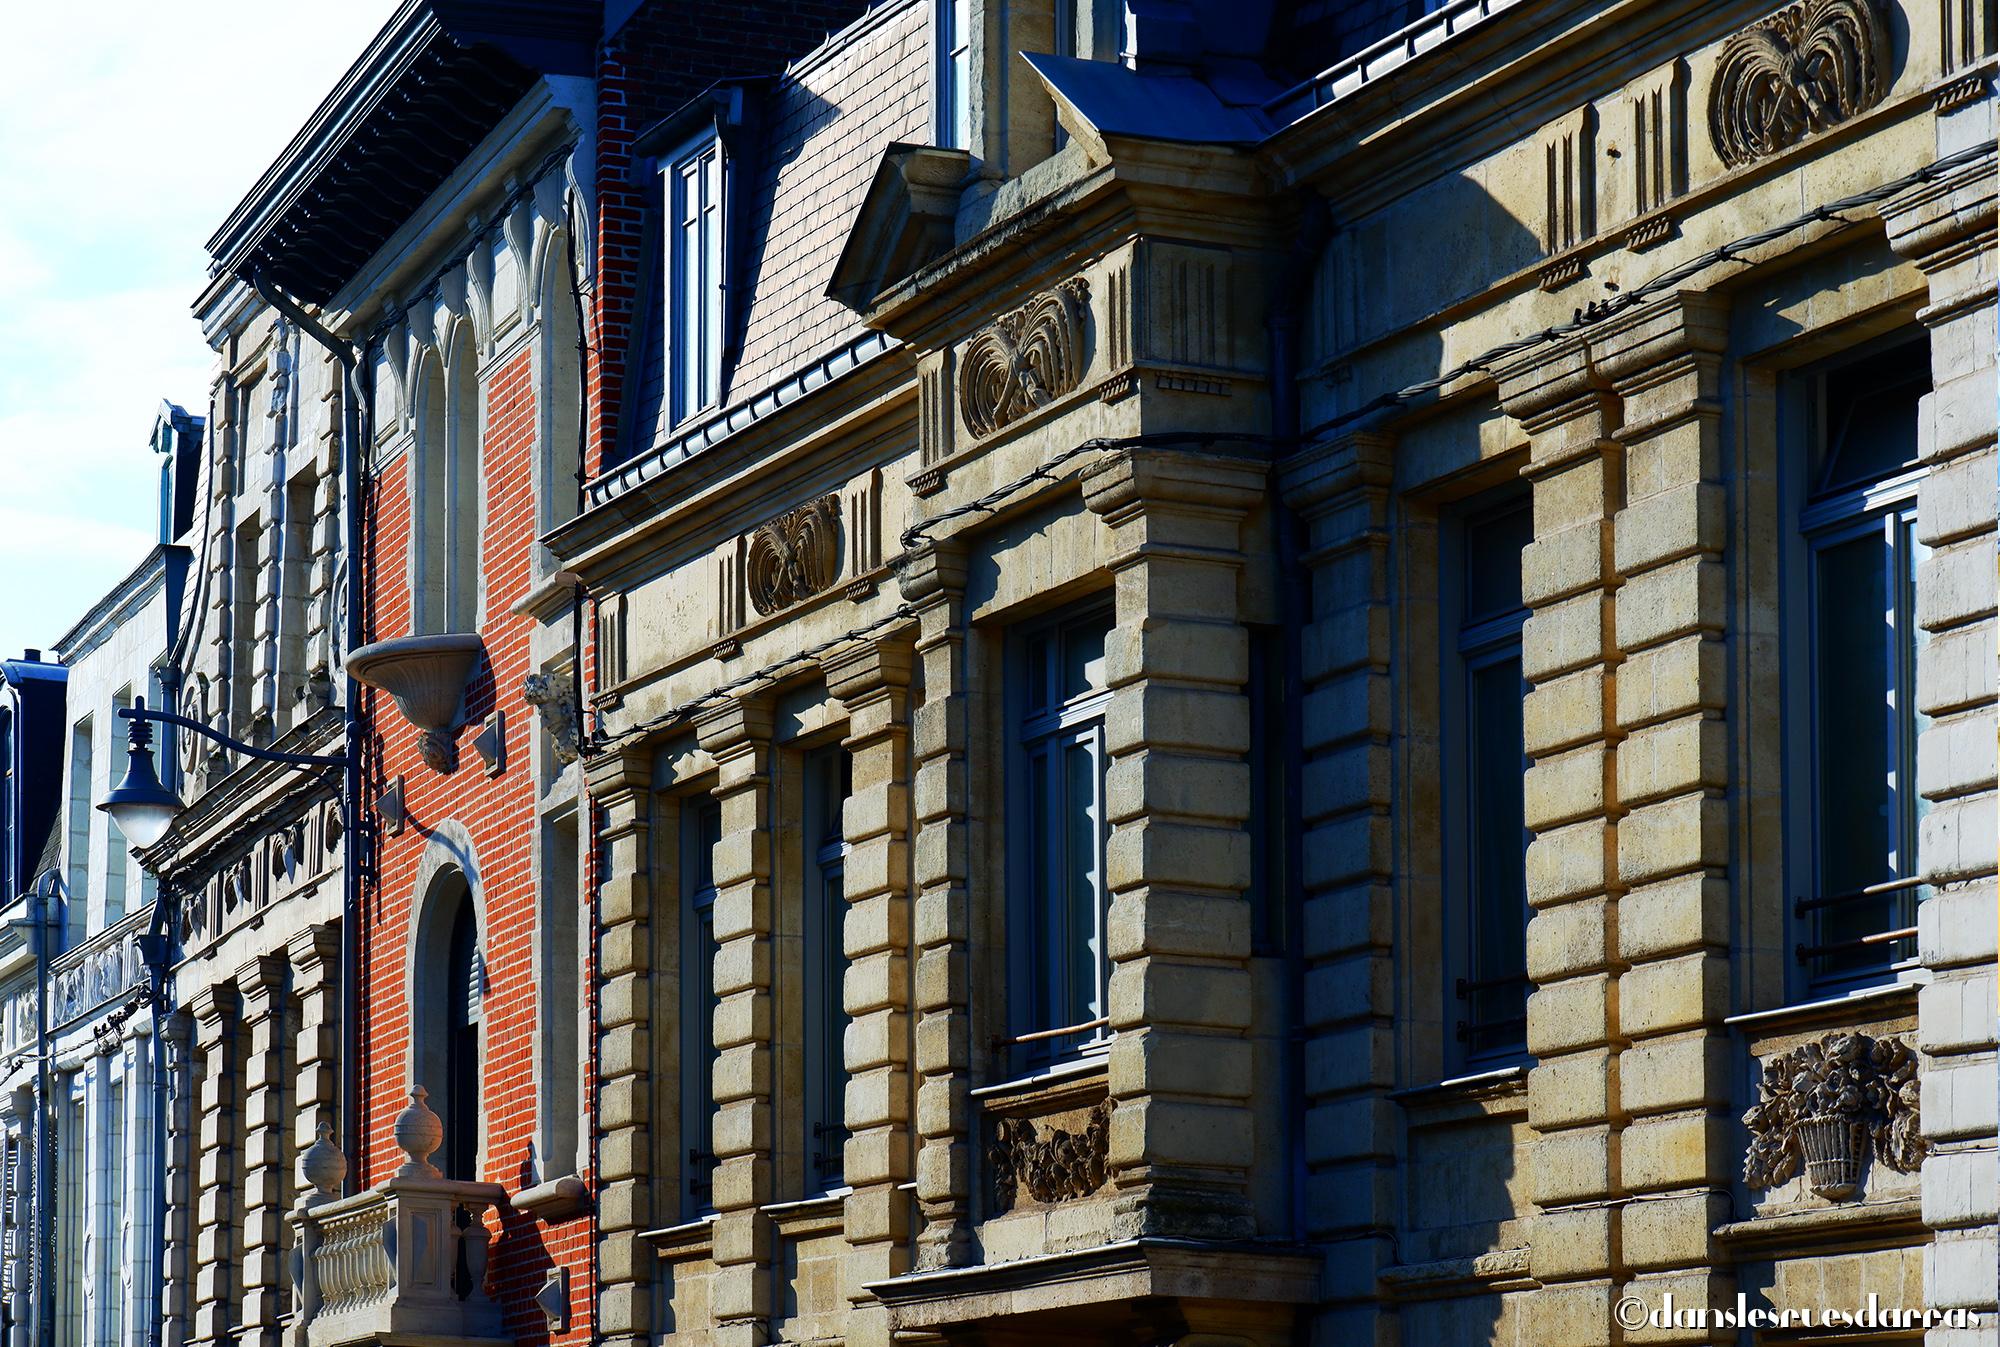 Hôtel de Hauteclocque - 2 rue des Capucins - Arras (©MD - danslesruesdarras)